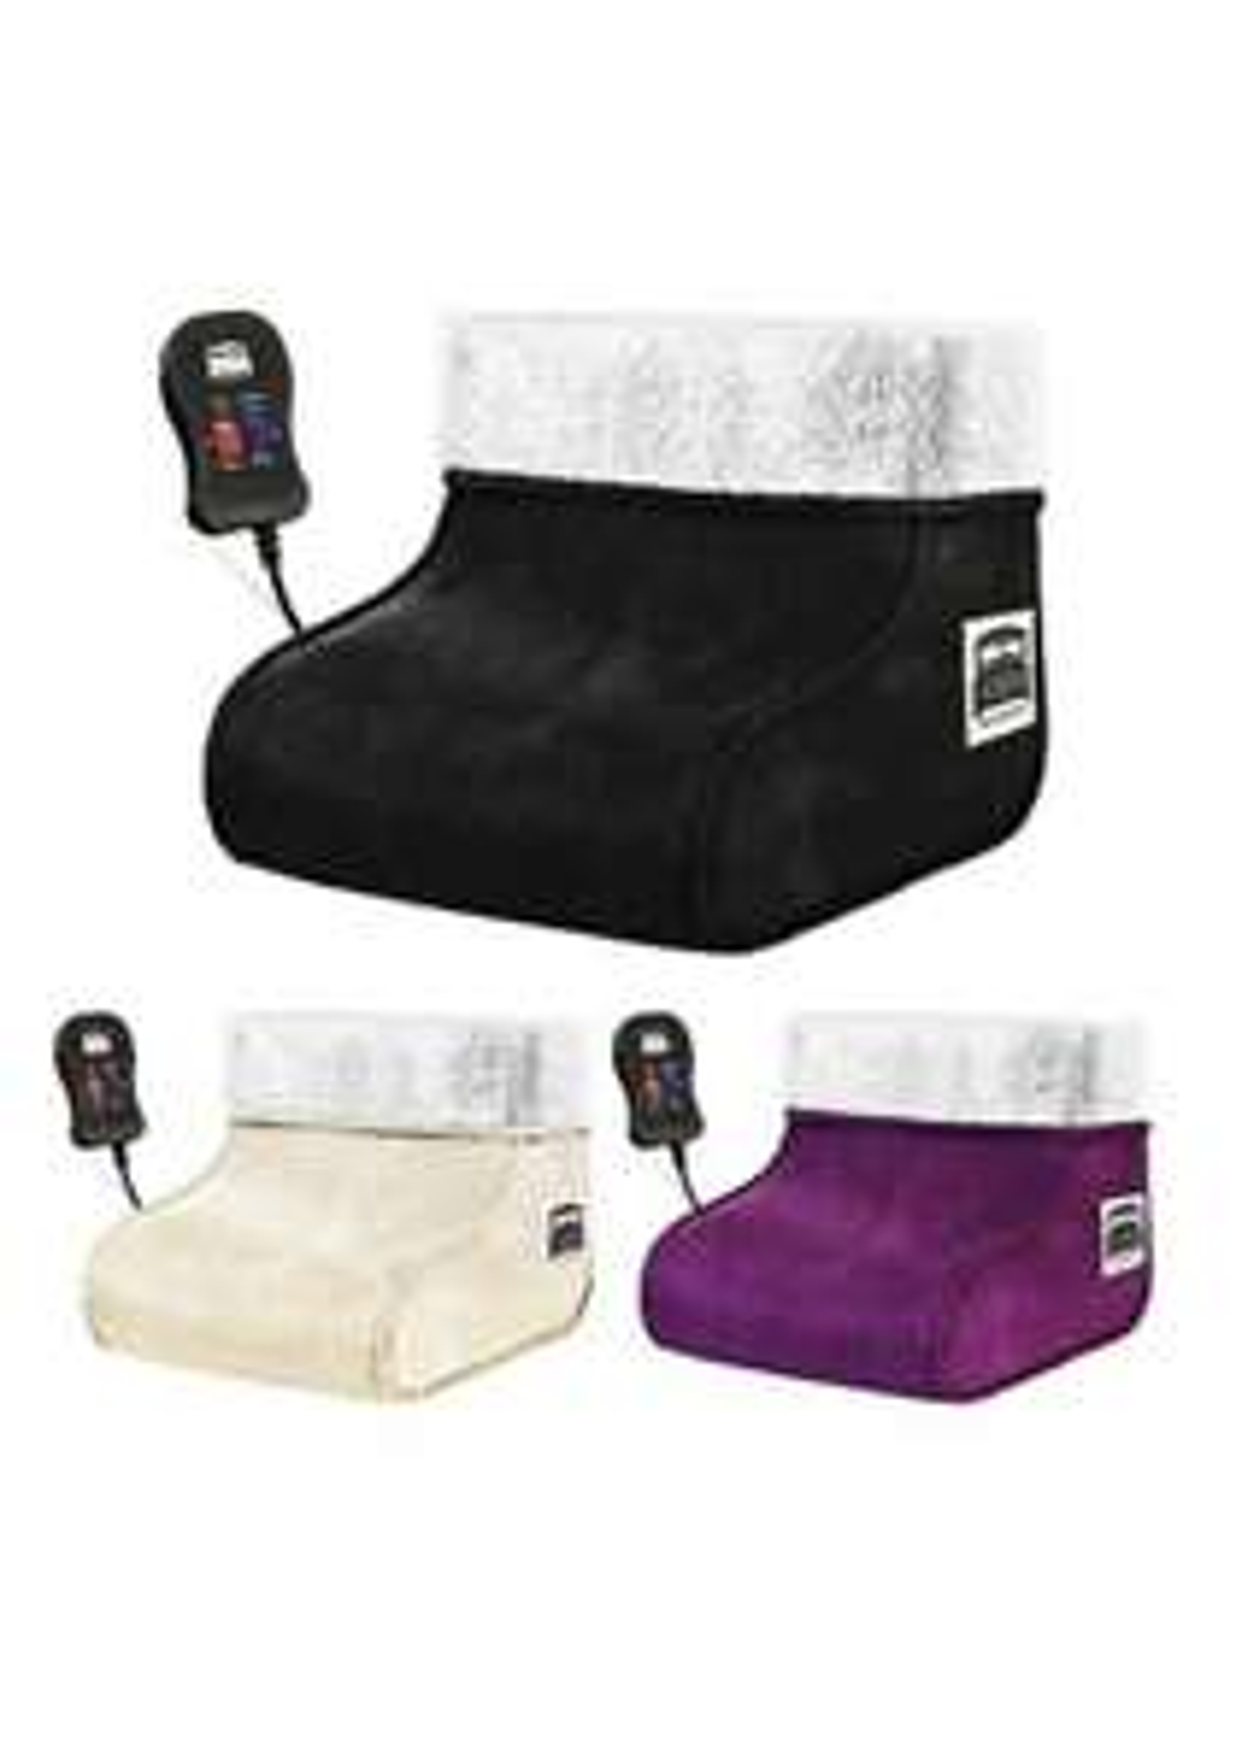 Electric foot warmer - £11.99 @ dickensbedding ebay